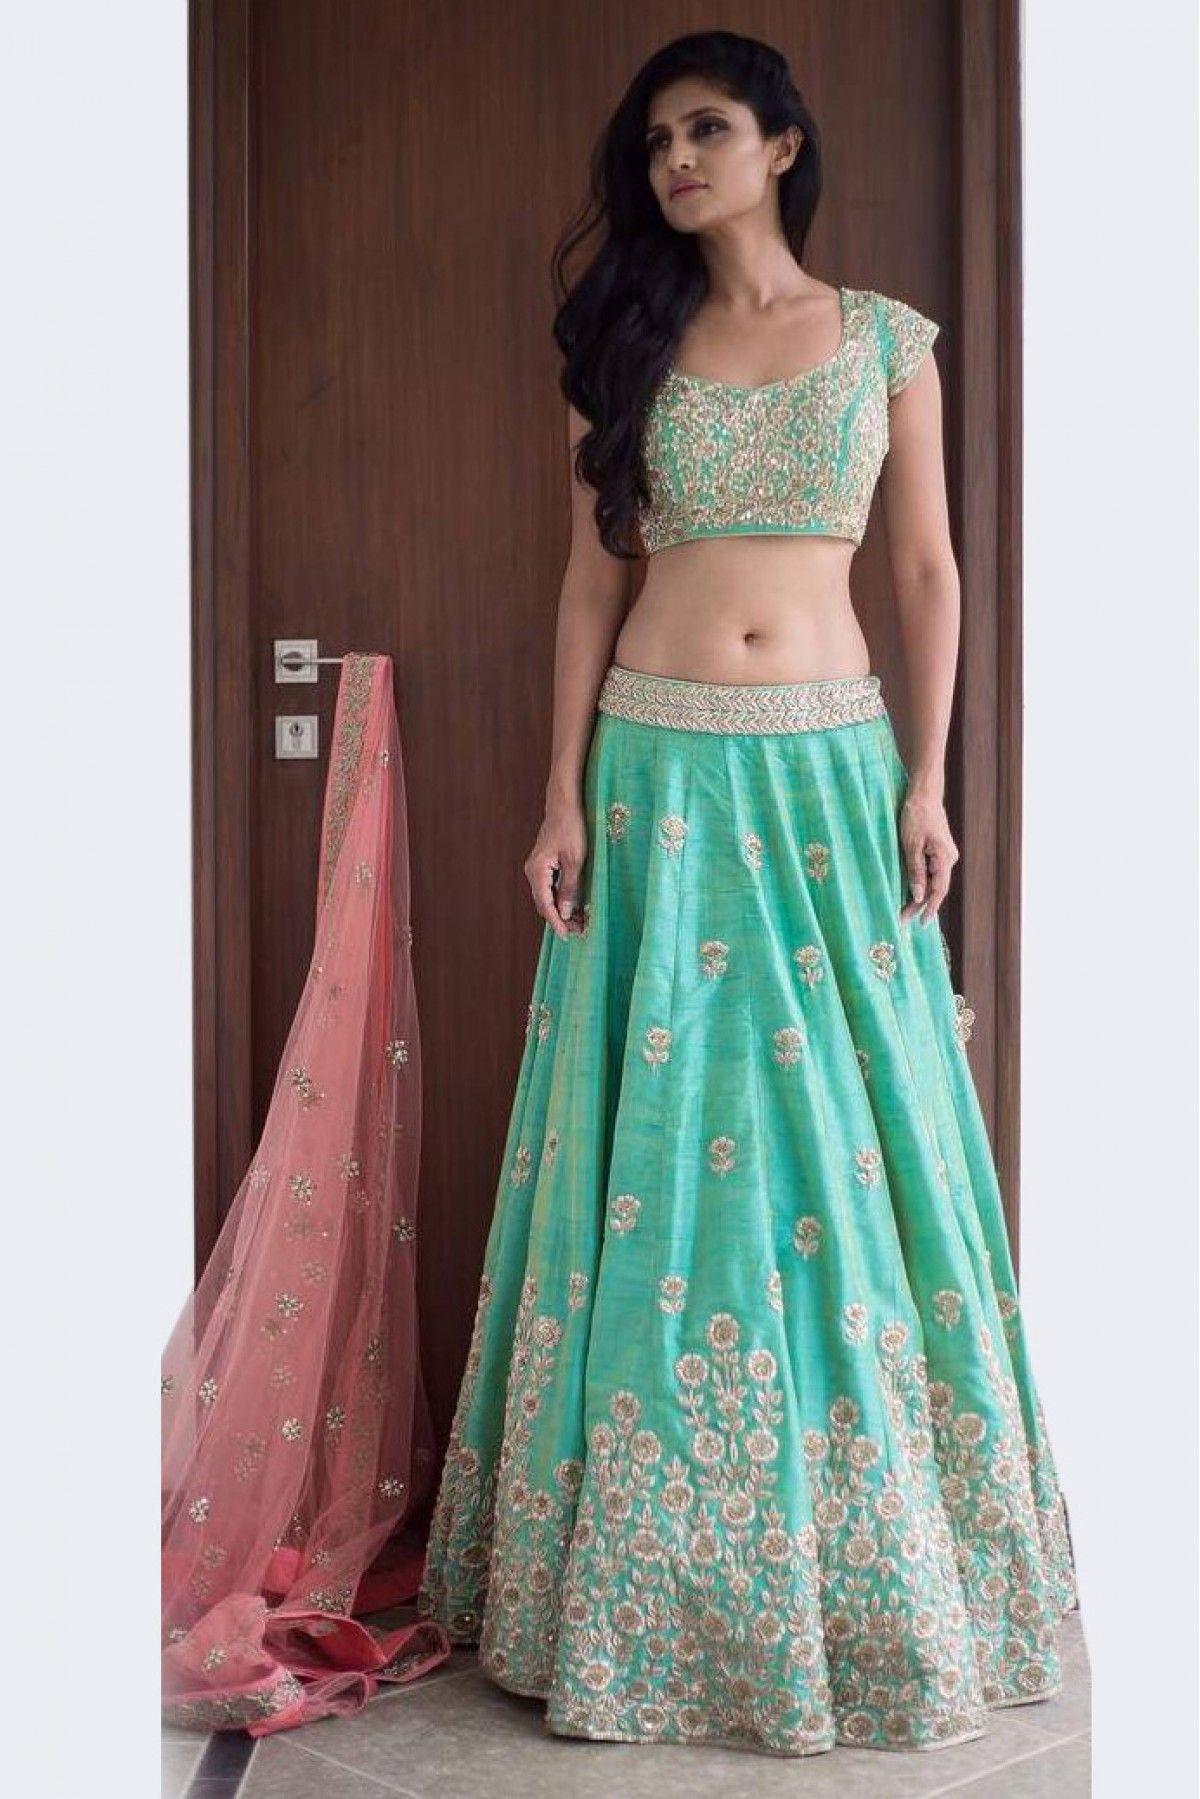 20237da990 Buy Art Silk And Net Lehenga Choli In Sea Green Colour @ ninecolours.com.  Customize Tailoring available!